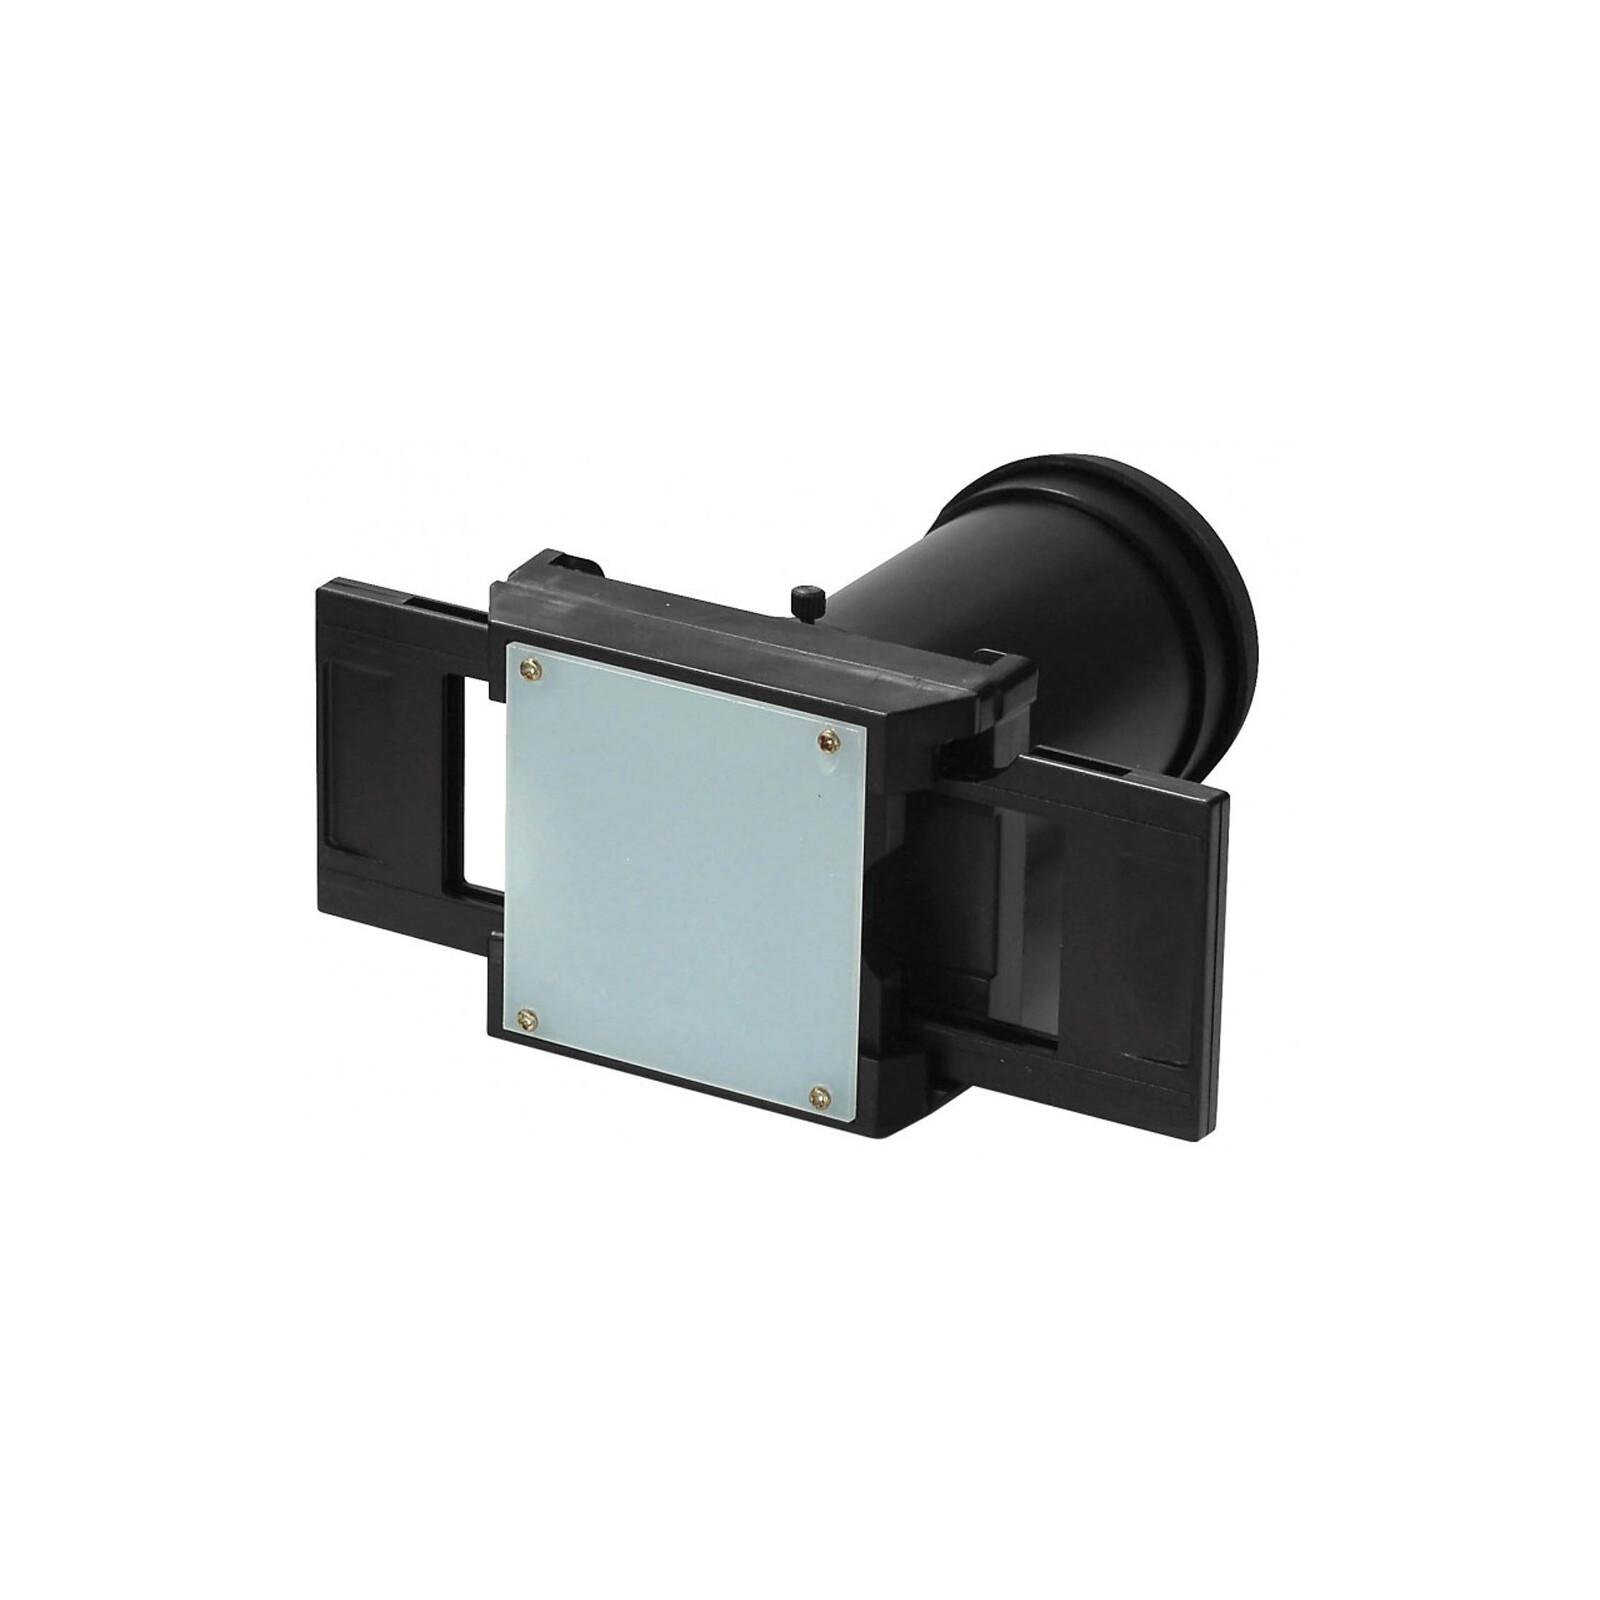 Reflecta HD Dia Duplikator